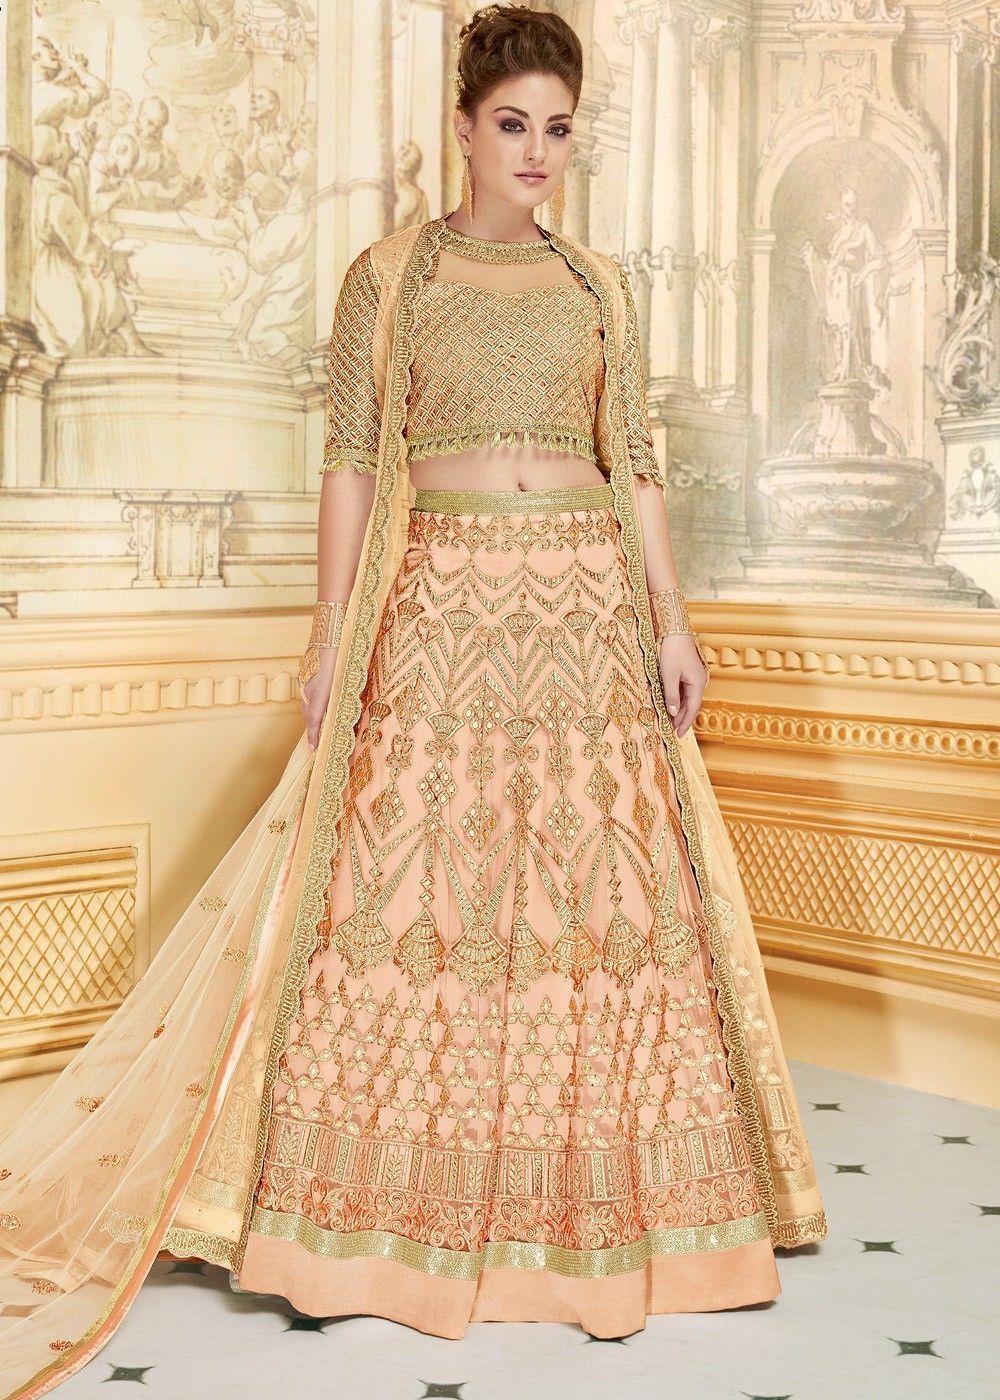 Peach net embroidered lehenga choli with jacket in eid